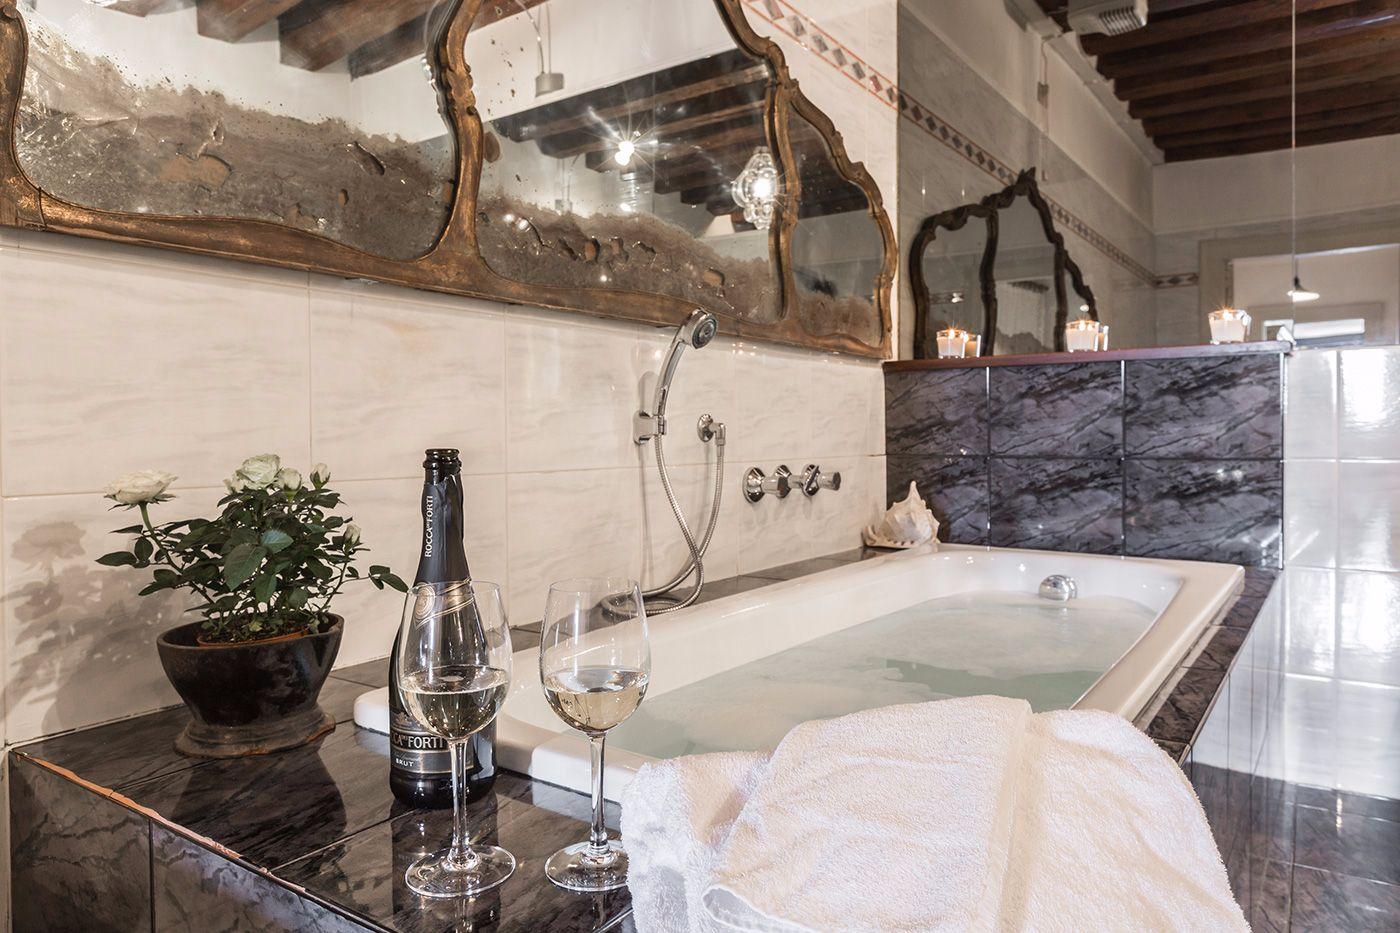 main bathroom with both shower and bathtub